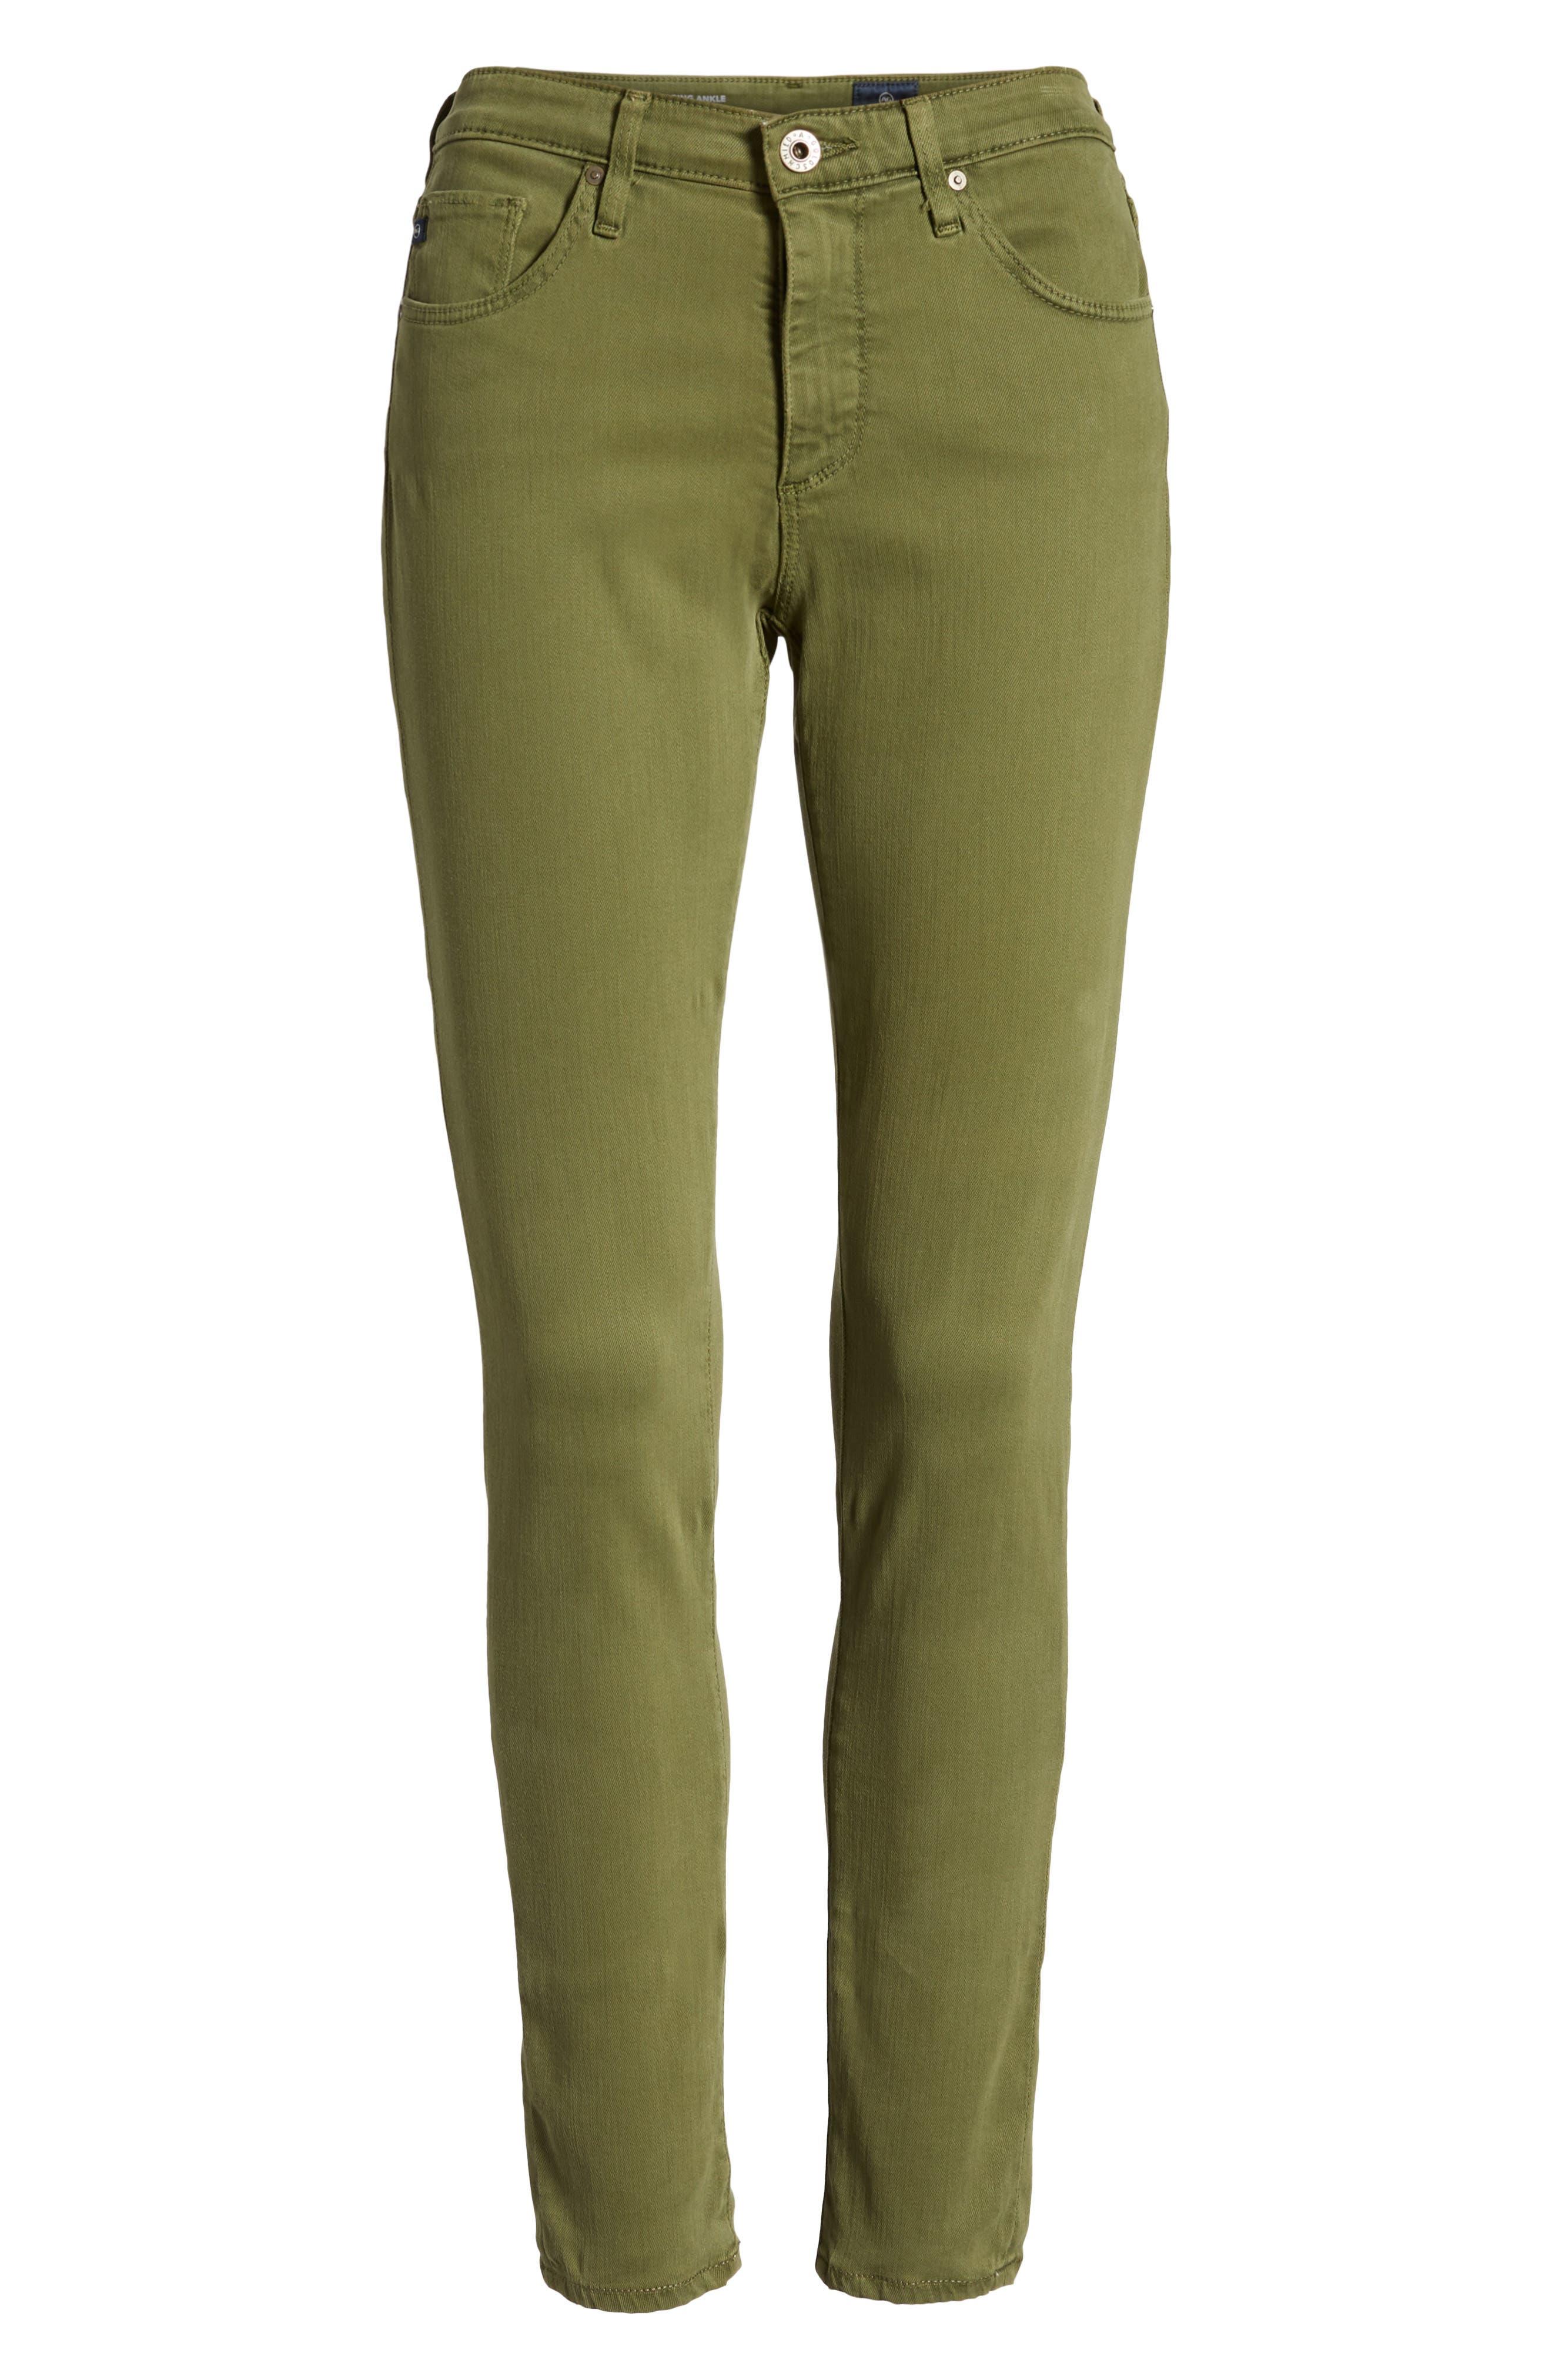 'The Legging' Ankle Jeans,                             Alternate thumbnail 7, color,                             SULFUR OLIVE GROVE